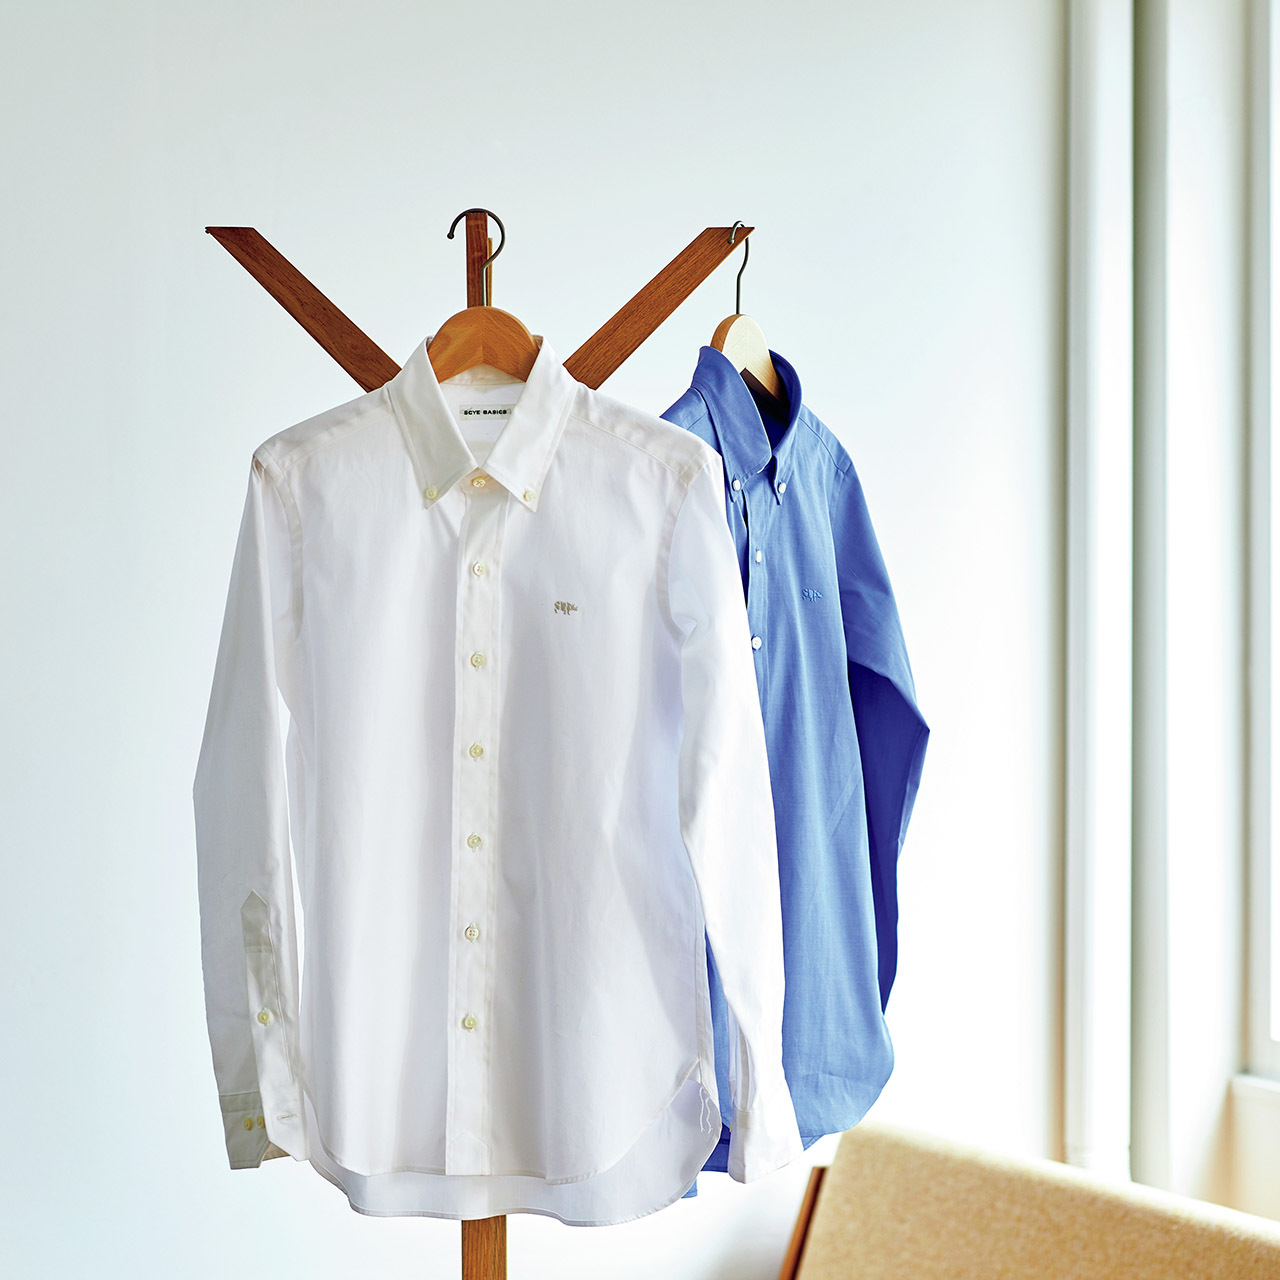 MADE IN JAPANの隠れた名品「SCYE BASICSのボタンダウンシャツ」_1_1